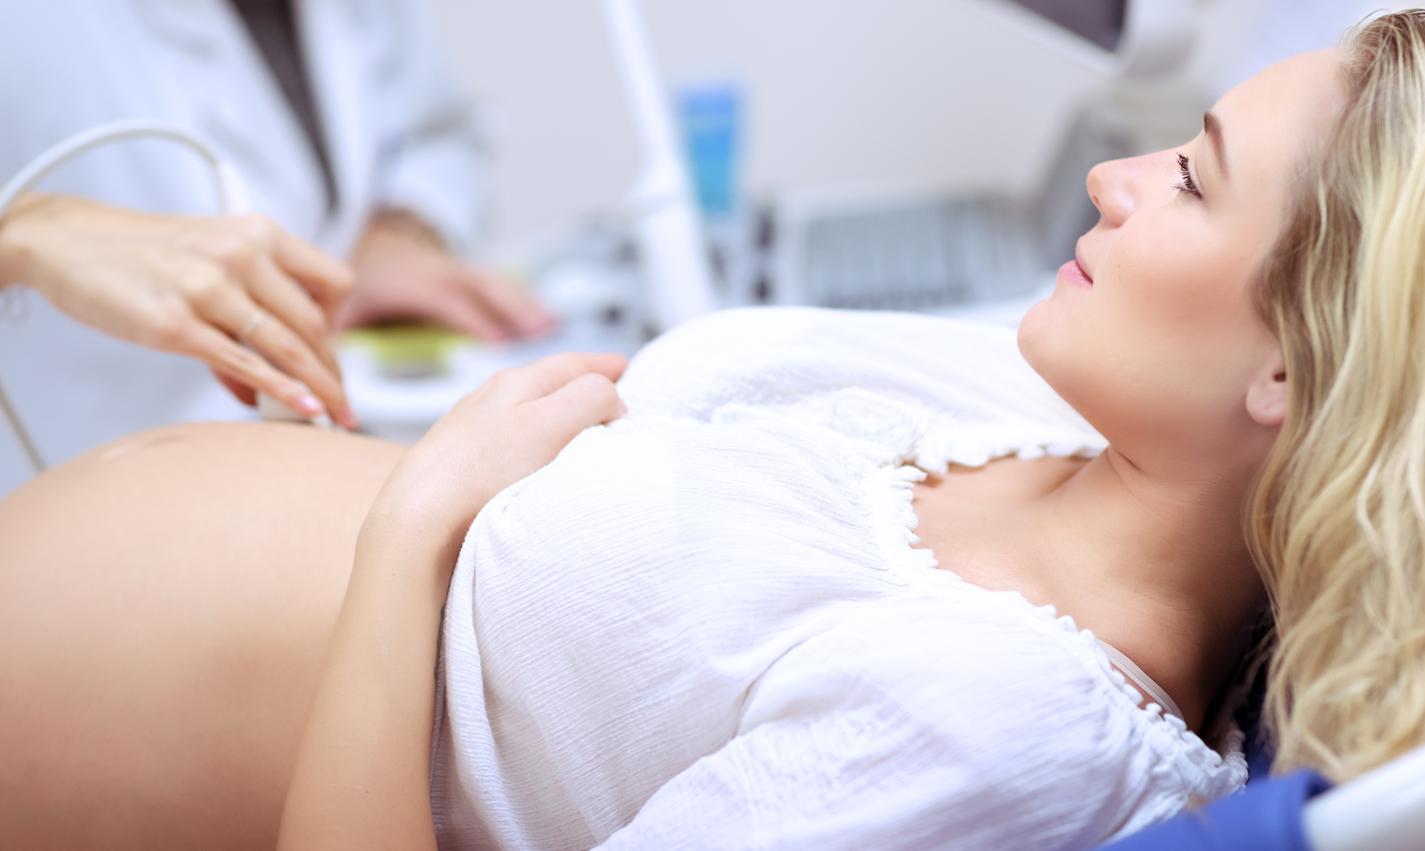 Obstetrician Gynecologist Broward Palm Beach Florida New Day Obgyn